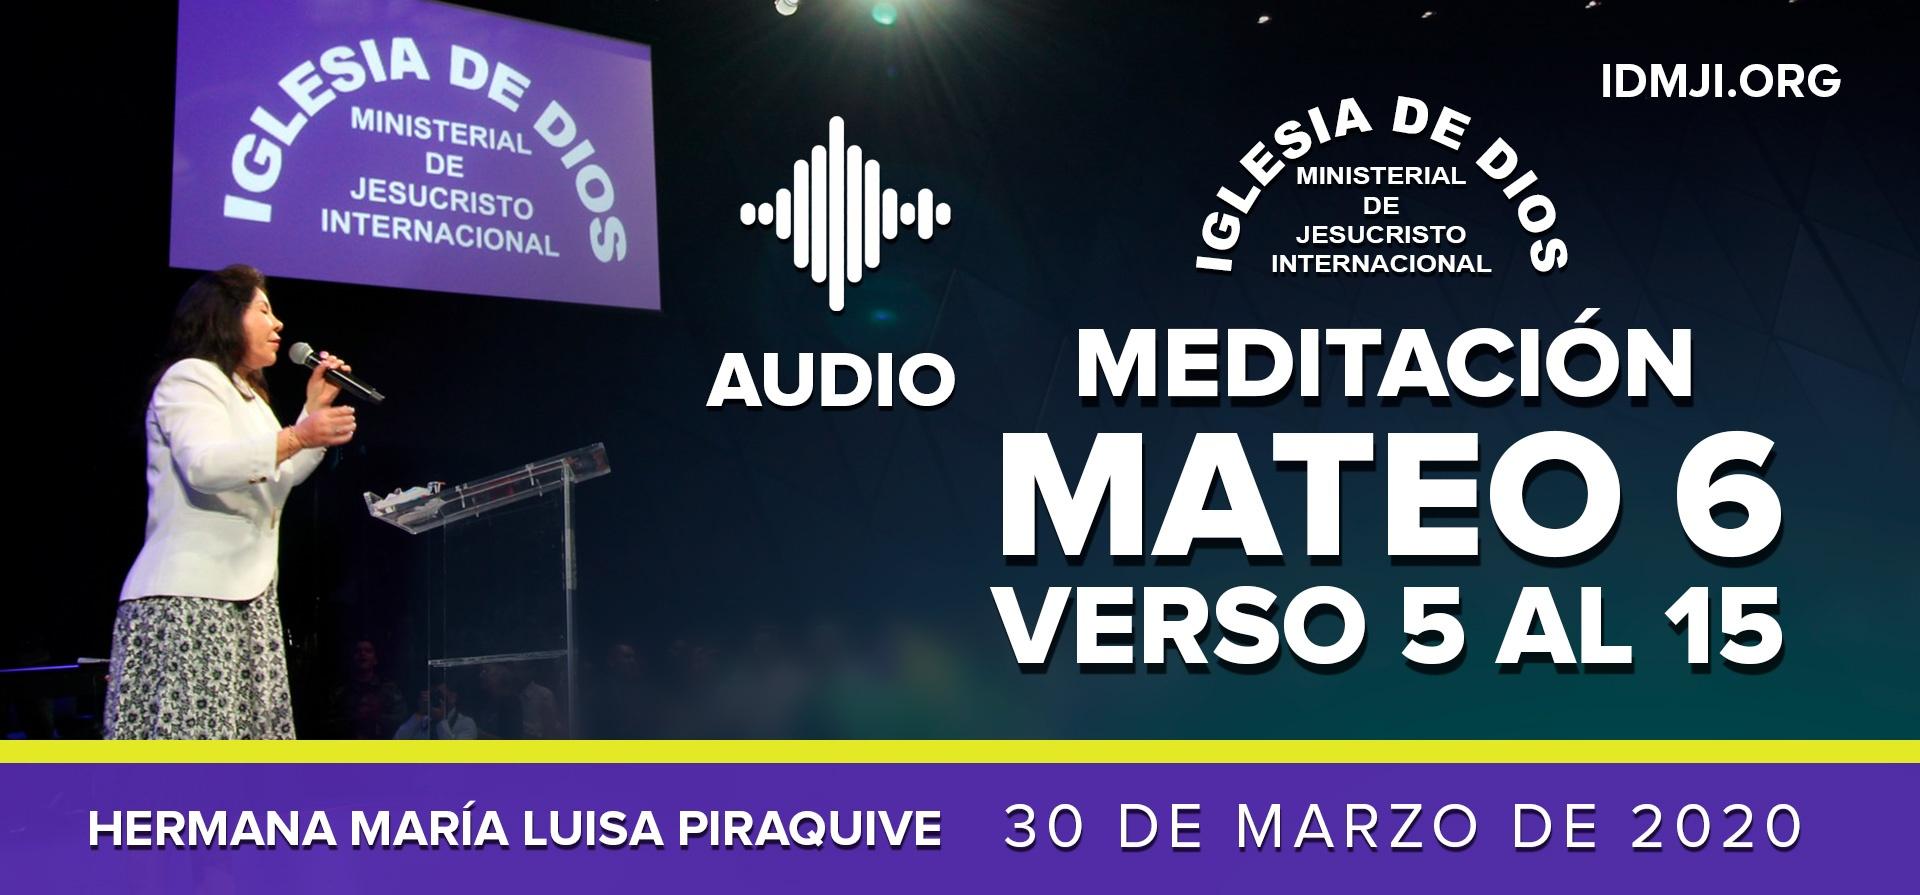 (Audio) Meditación: Mateo 6, verso 5 al 15 – Hna. María Luisa Piraquive – 30 de marzo de 2020